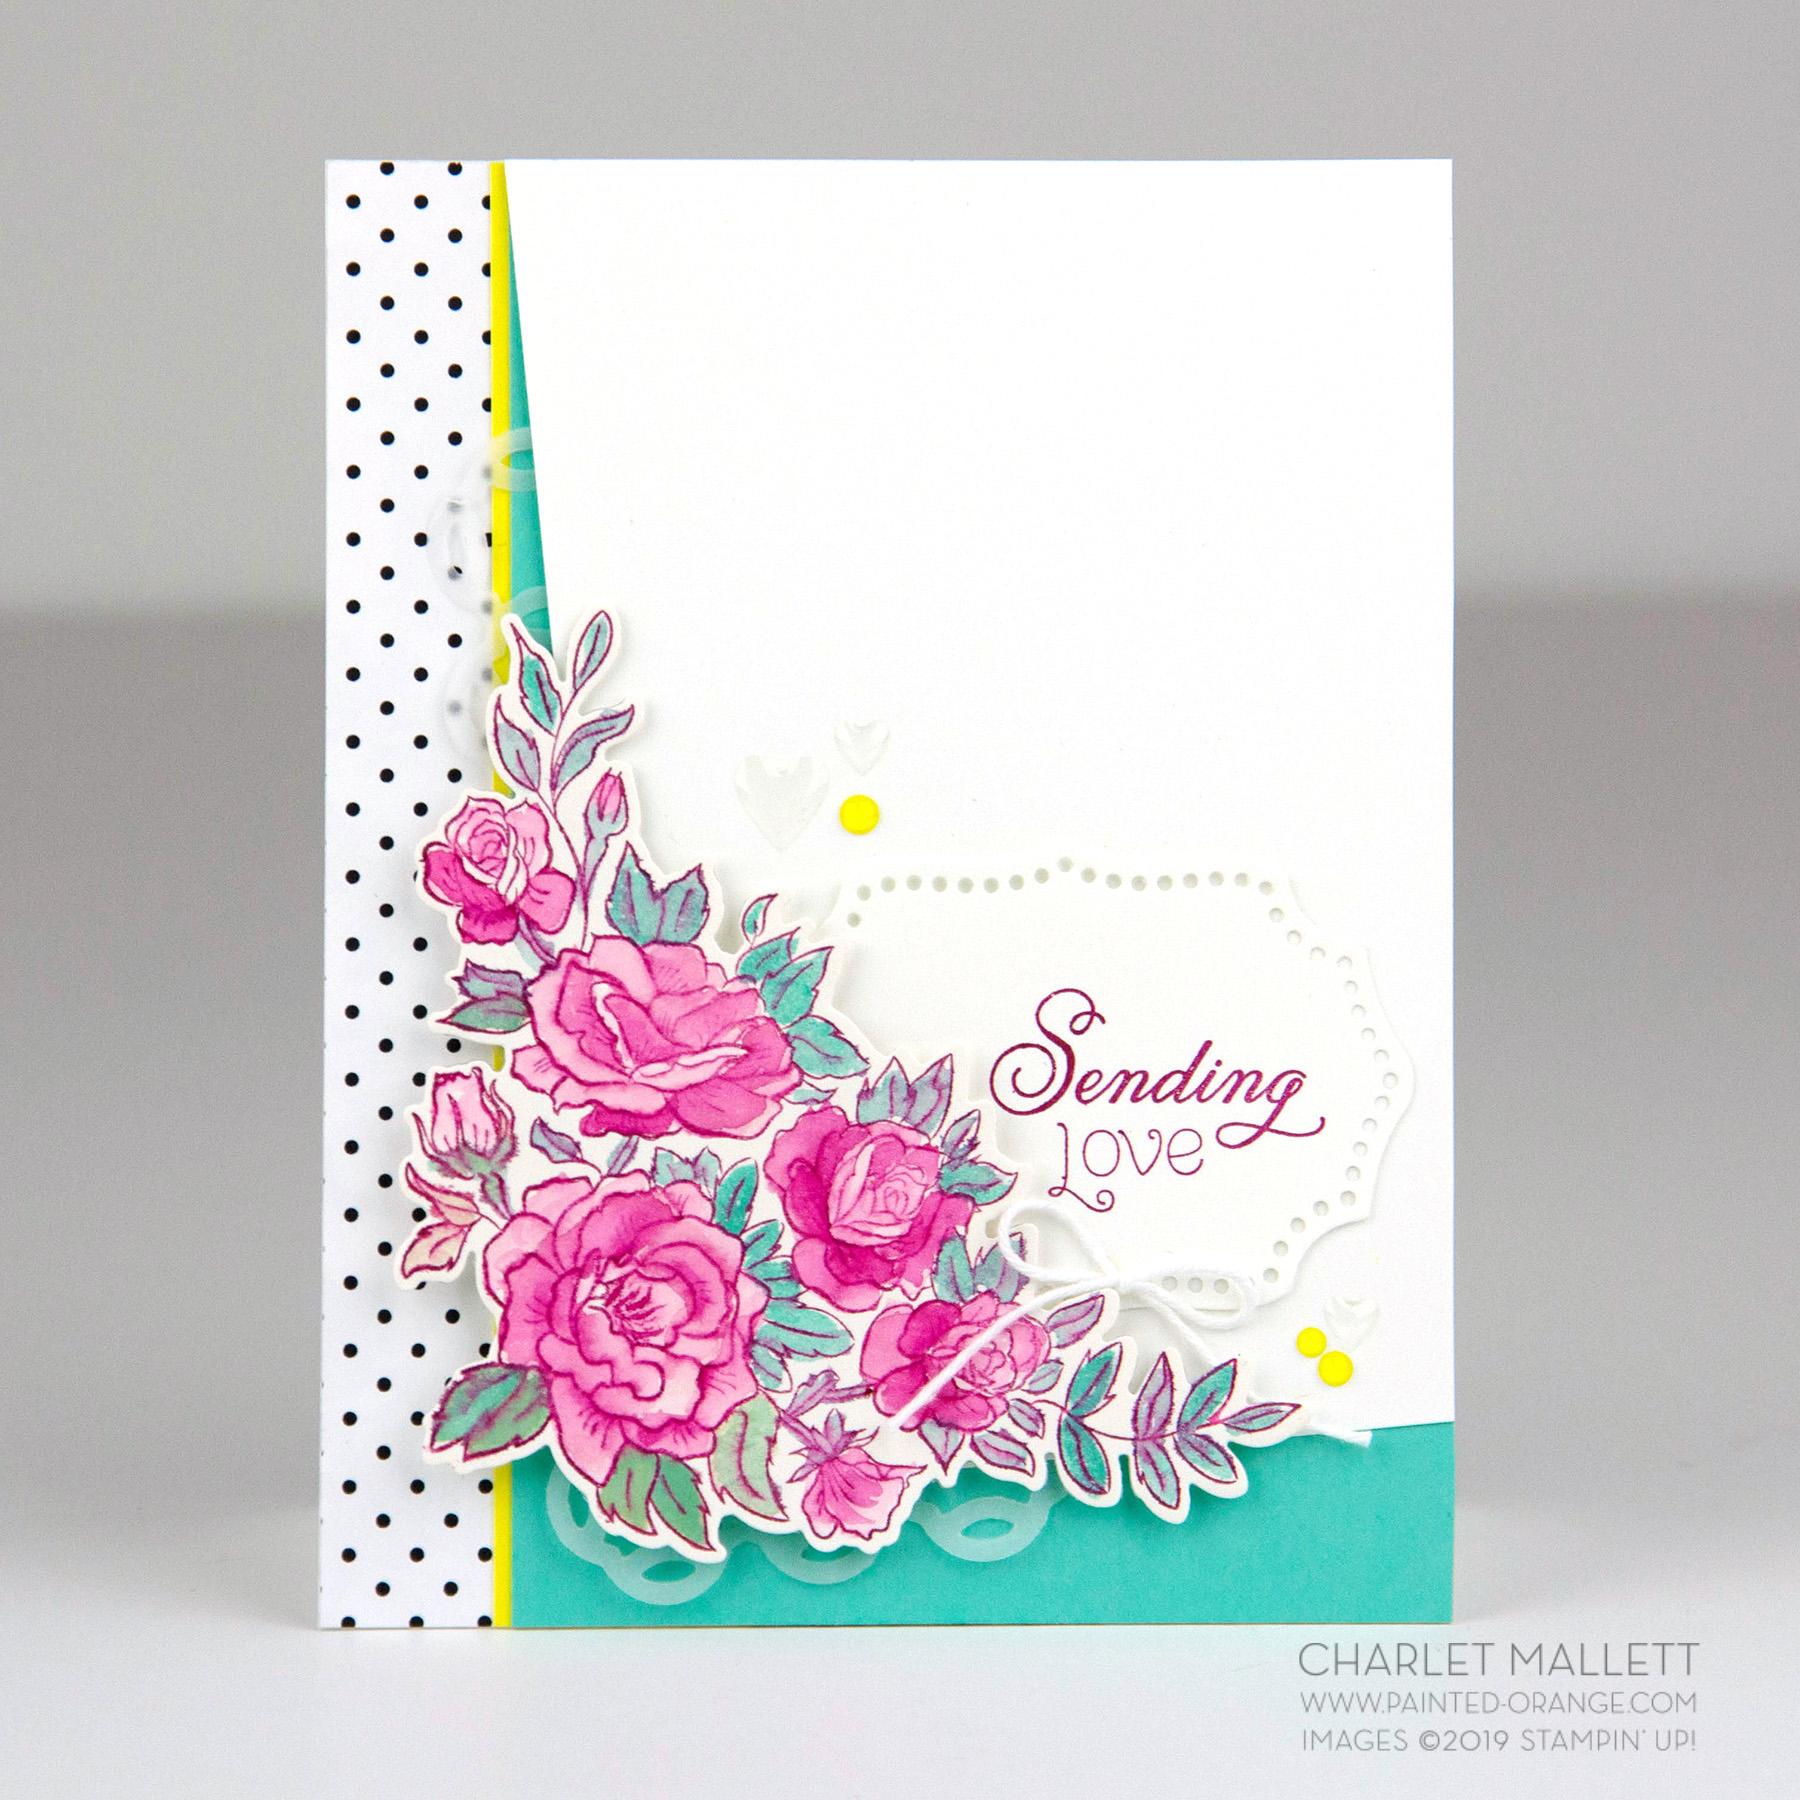 Climbing Roses Valentine card - Charlet Mallett, Stampin' Up!